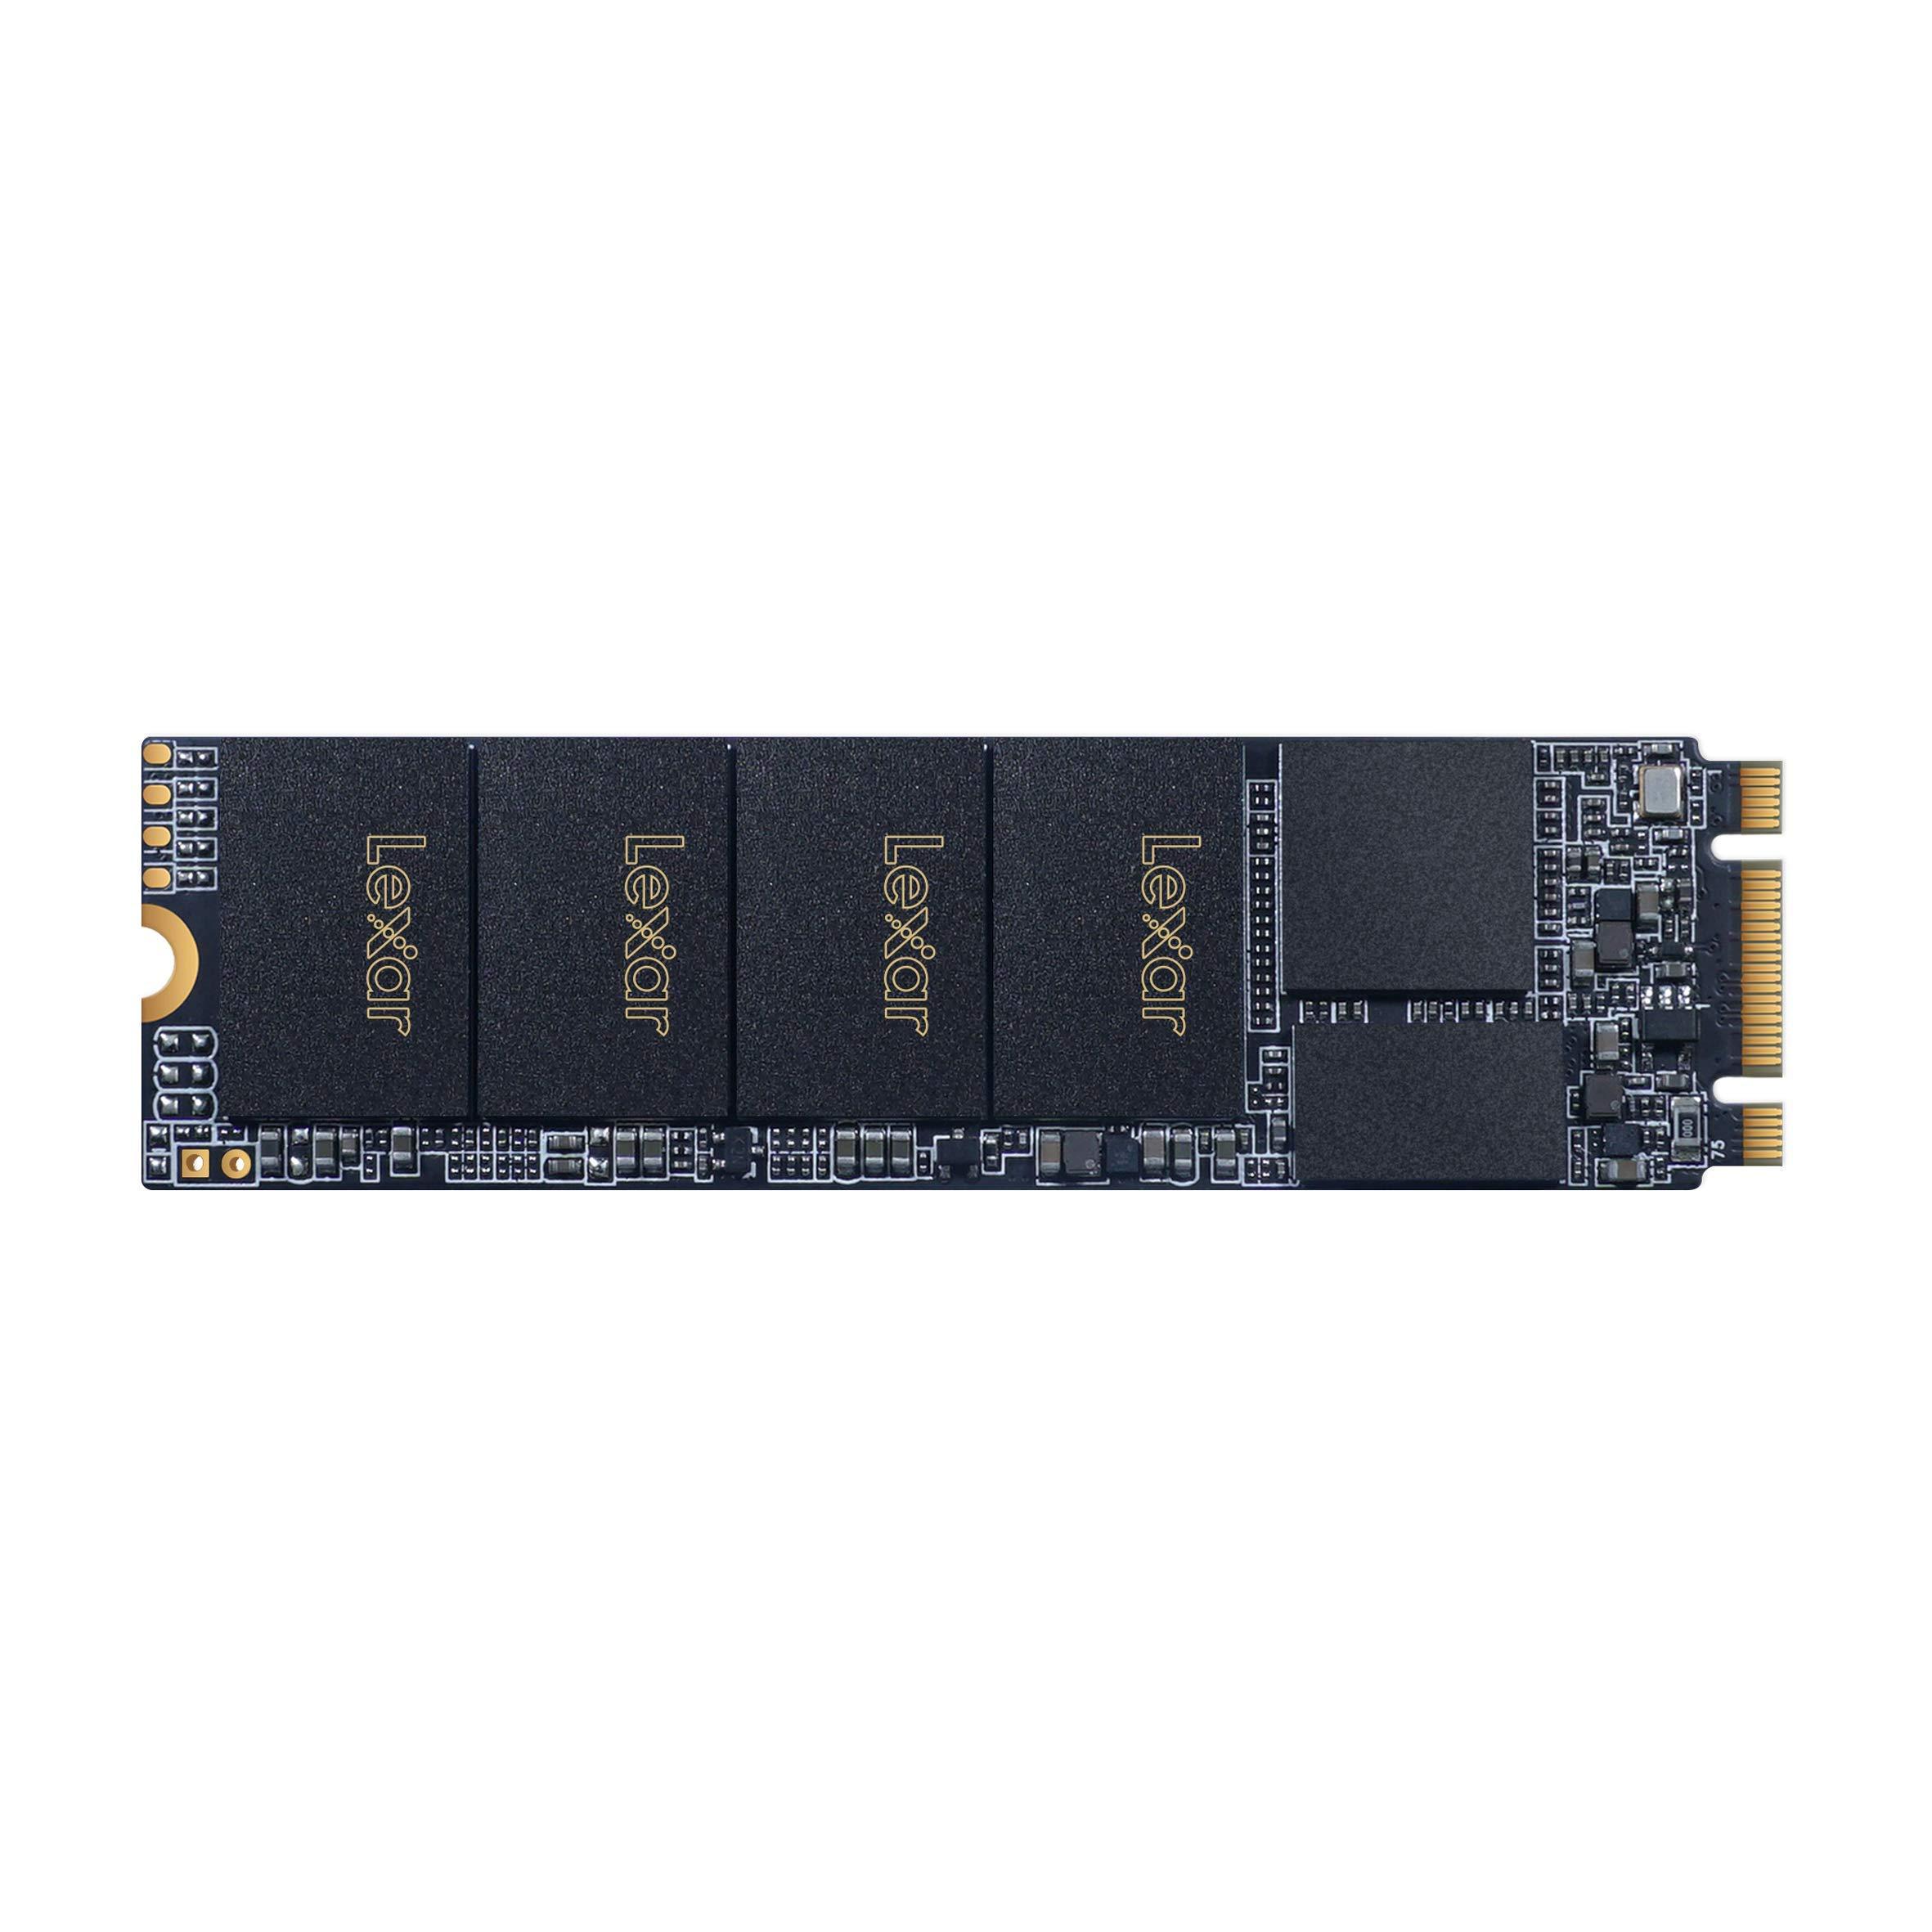 SSD : Lexar NM210 M.2 SATA III (6Gb/s) 256GB Solid-State...